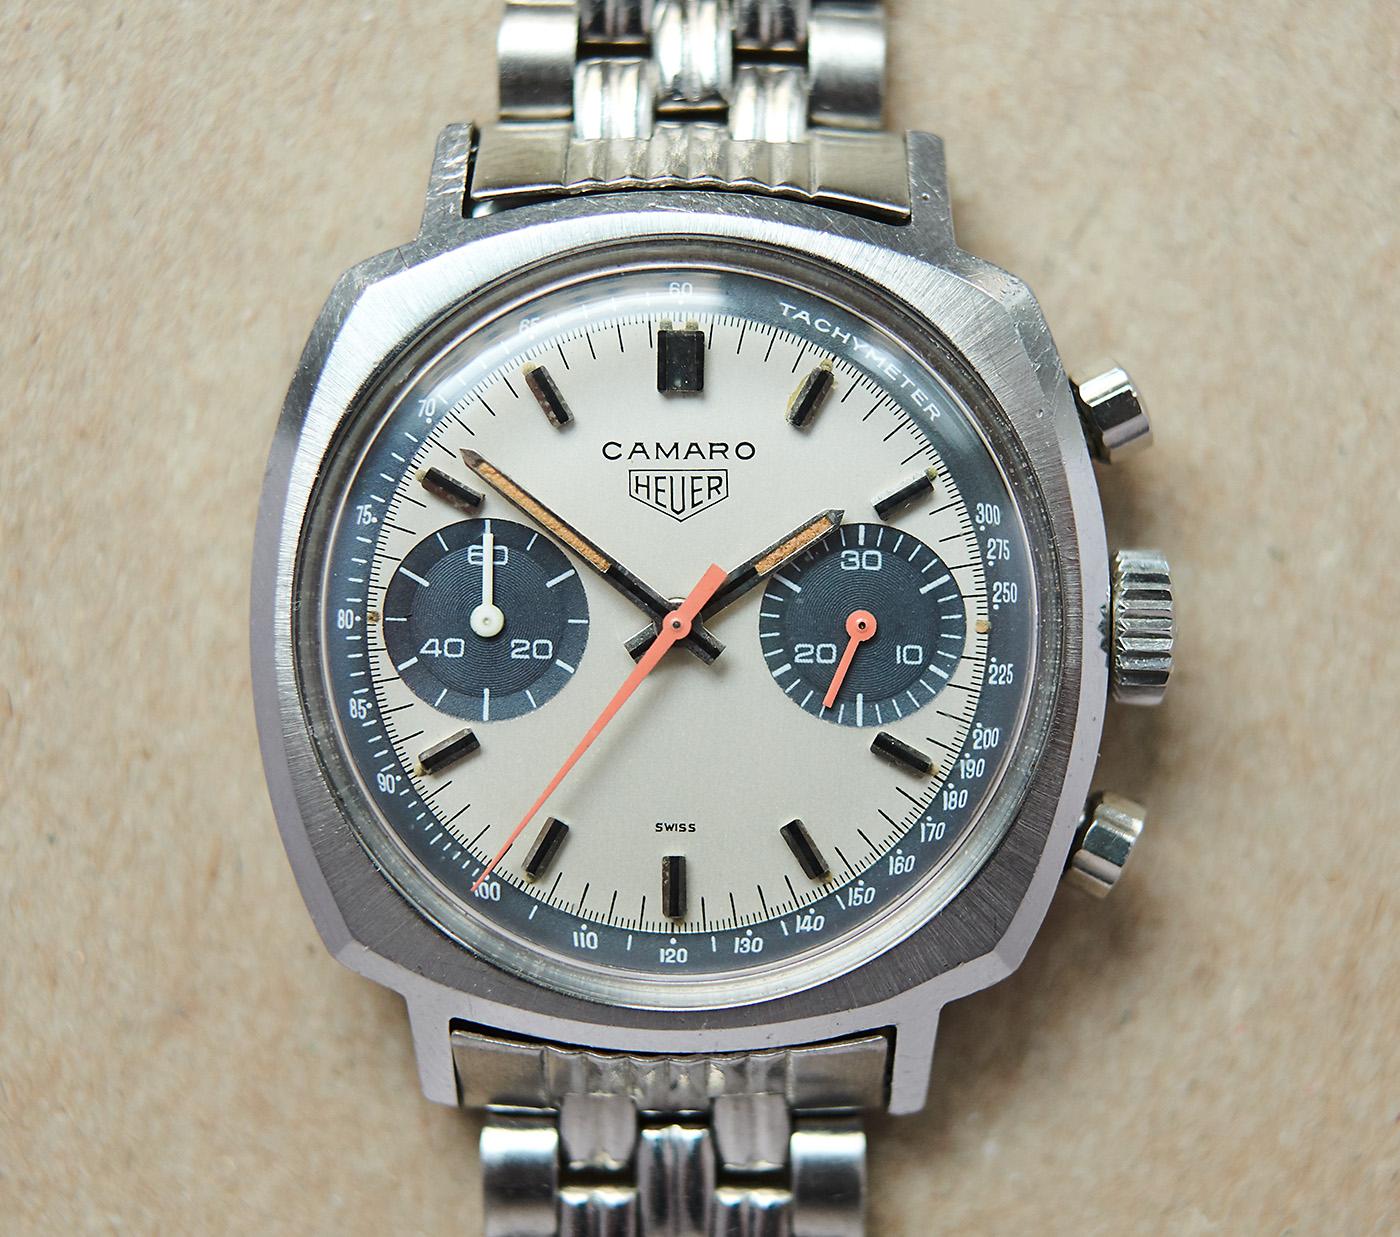 Heuer Camaro 7743 Exotic dial